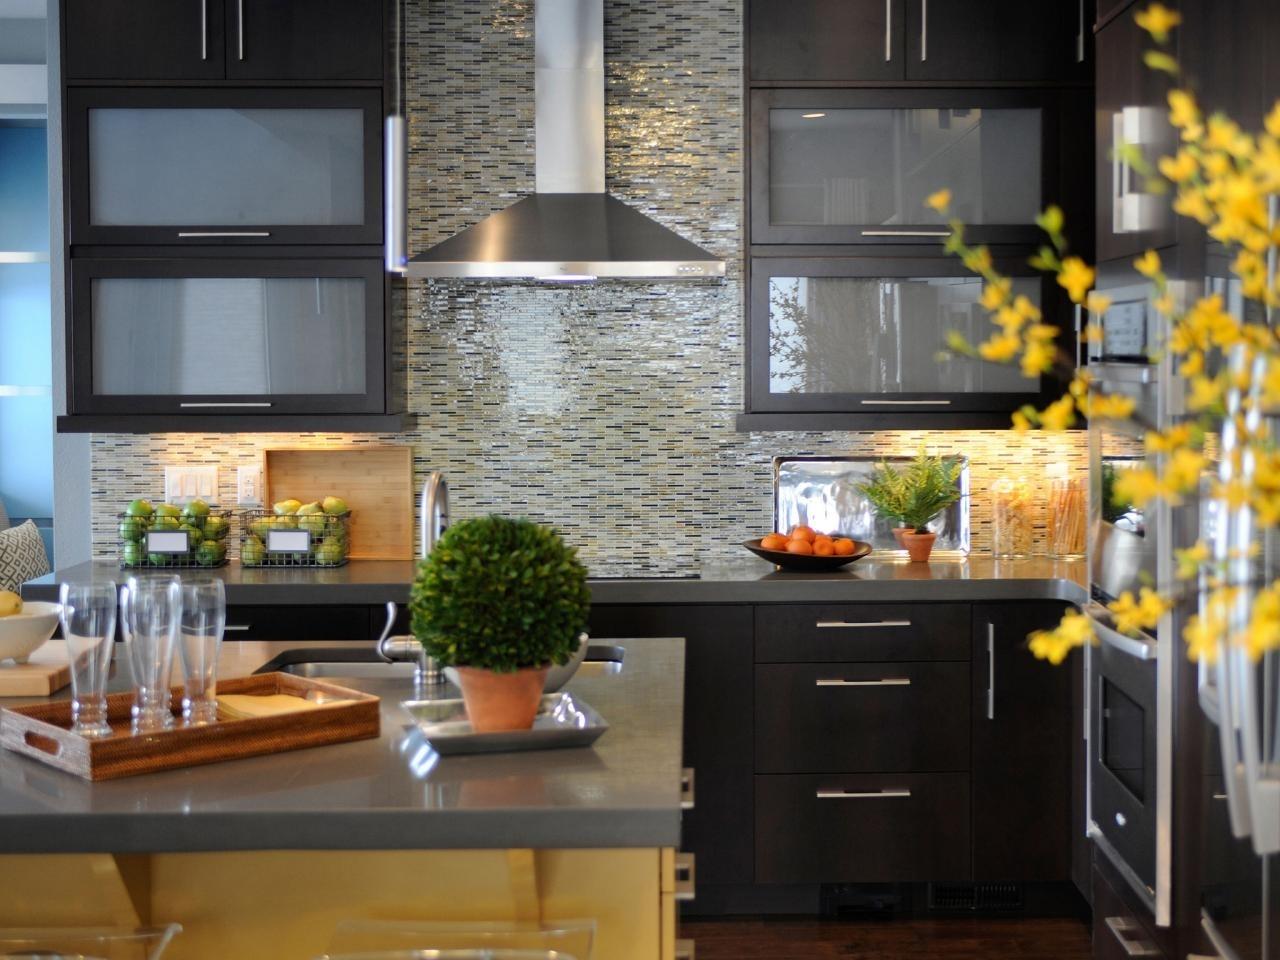 10 Fashionable Backsplash Tile Ideas For Kitchen %name 2020